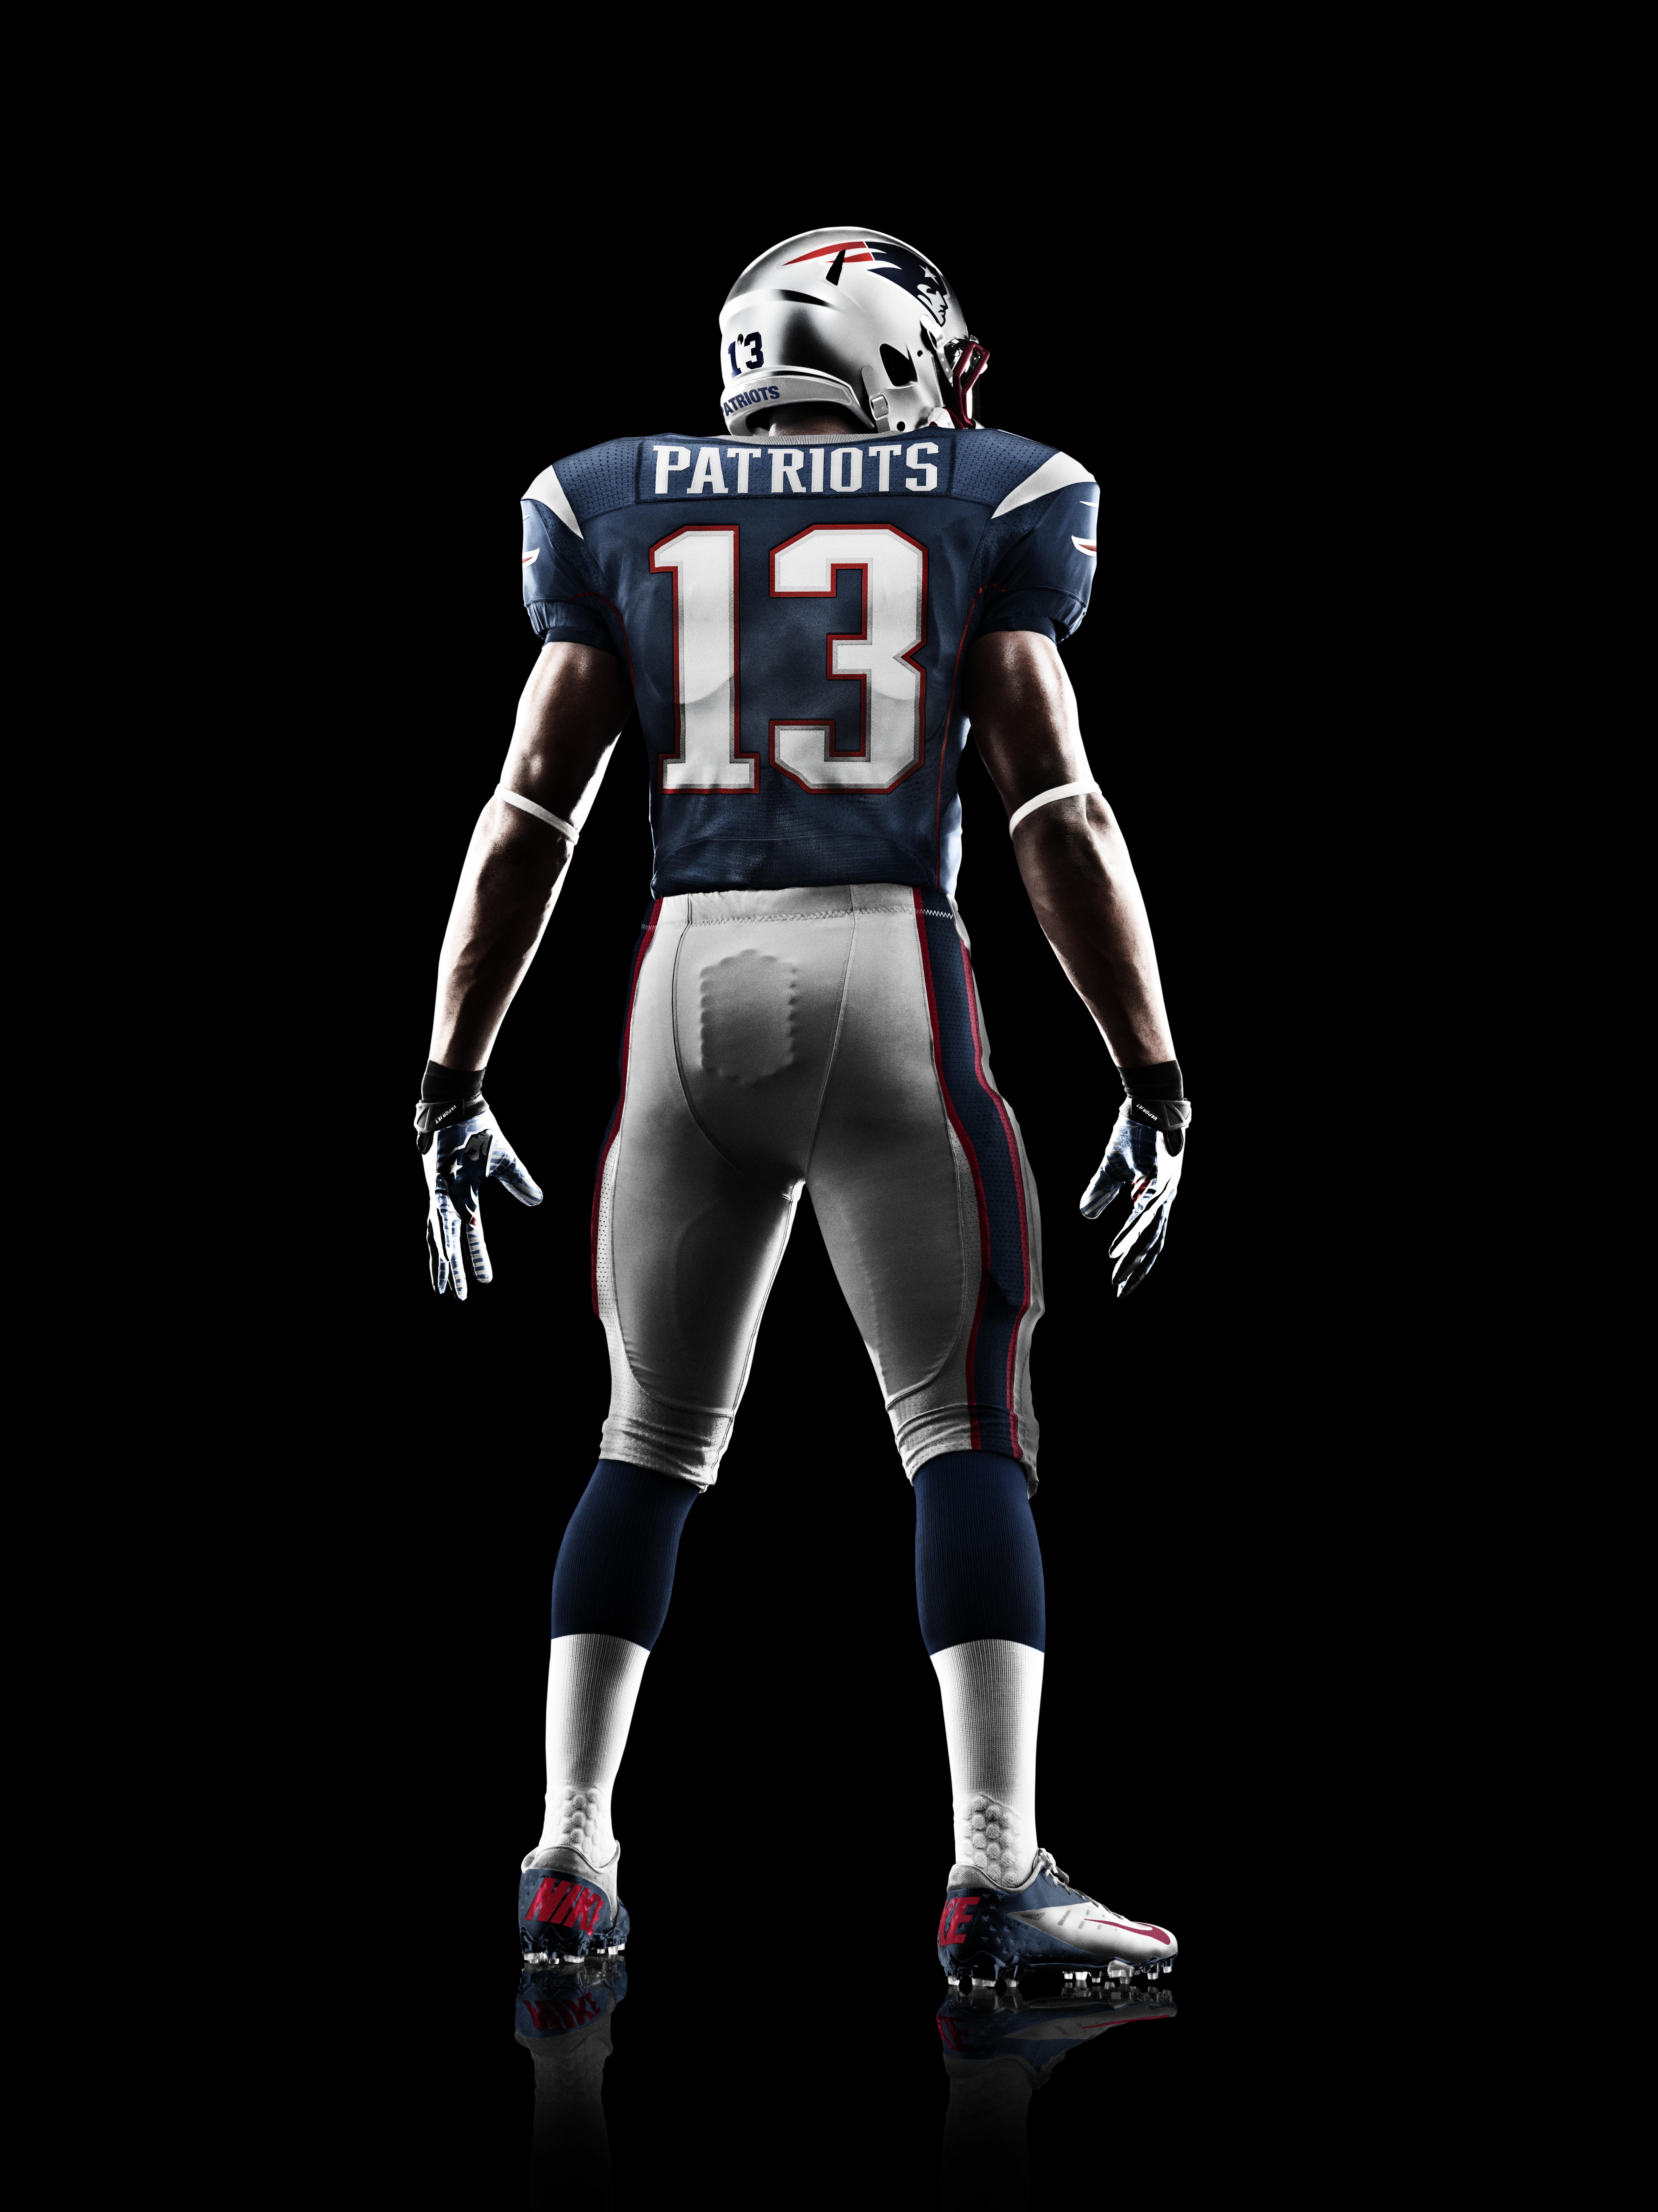 Nike News - New England Patriots 2012 Nike Football Uniform